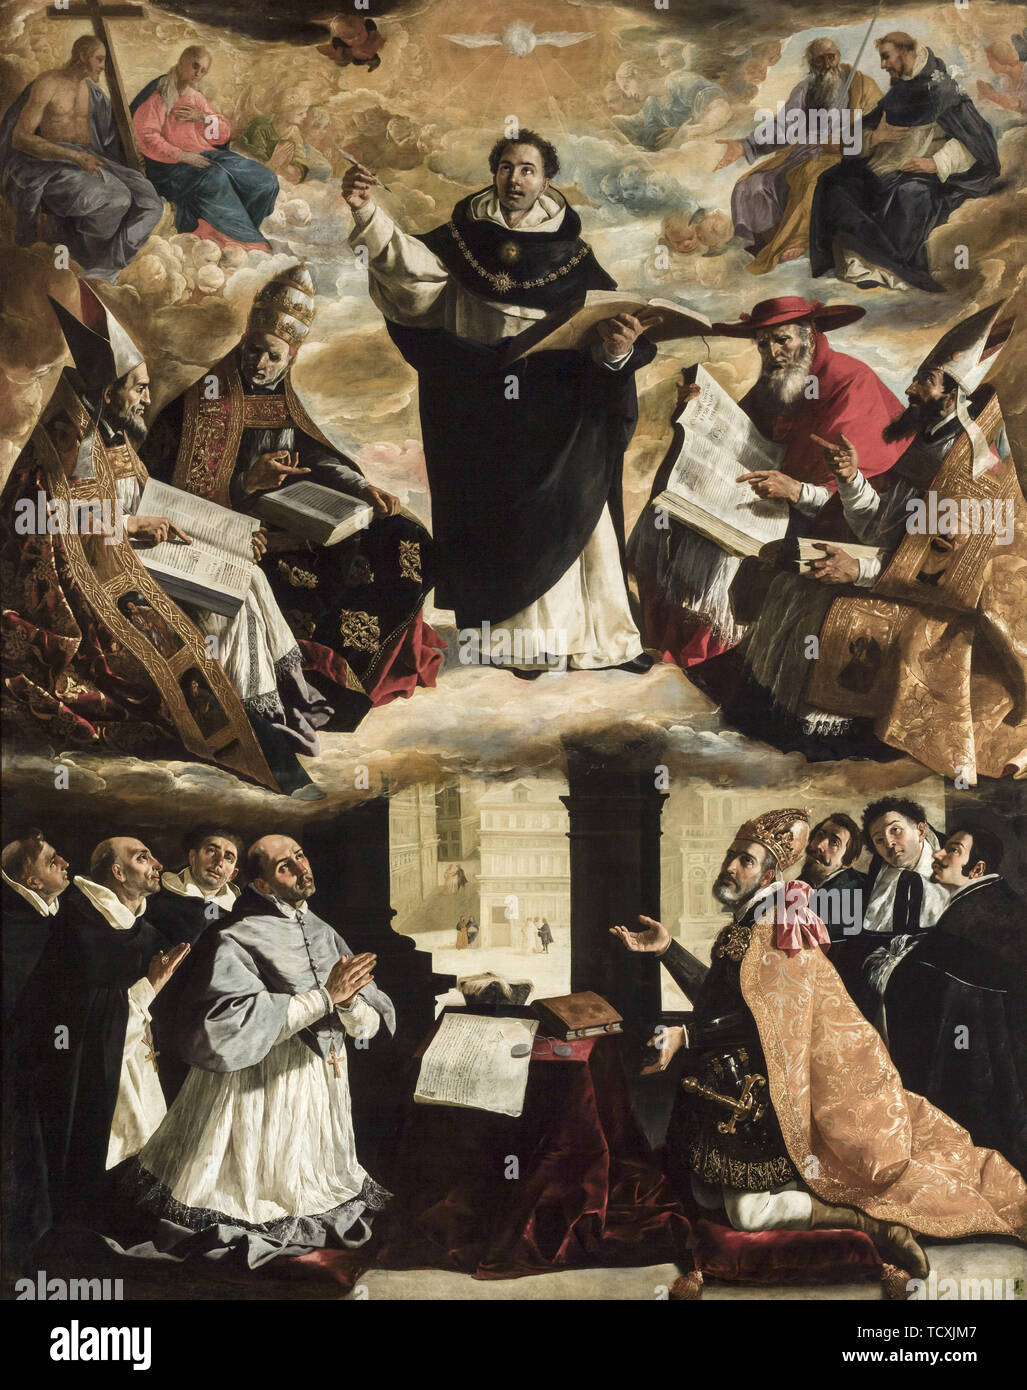 The Apotheosis of Saint Thomas Aquinas, ca 1631. Found in the Collection of Museo de Bellas Artes, Sevilla. - Stock Image